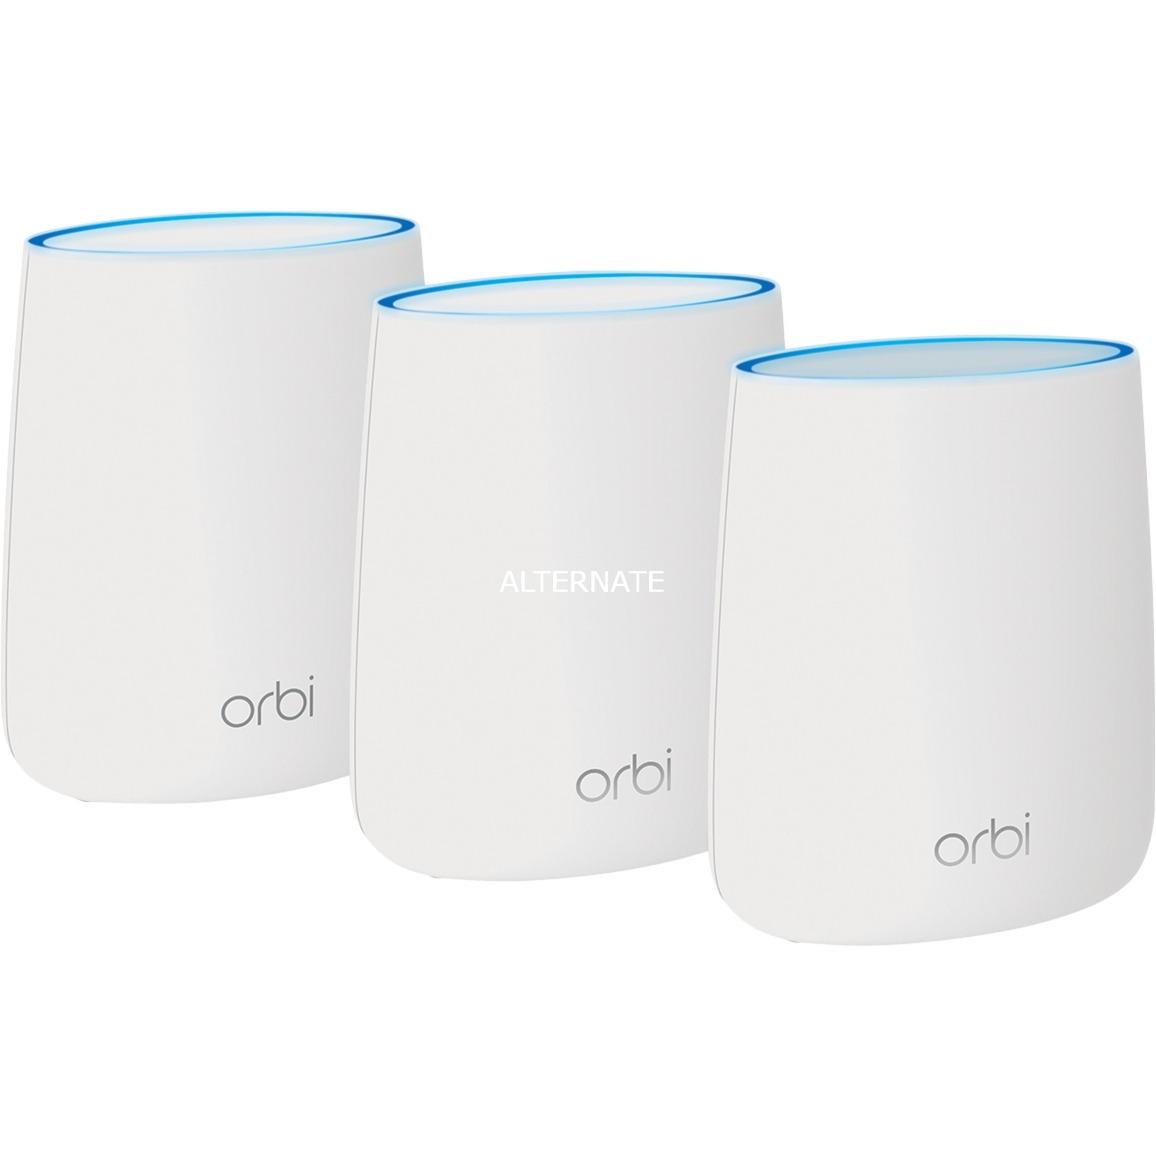 Orbi RBK23 Tri-bande (2,4 GHz / 5 GHz / 5 GHz) Gigabit Ethernet Blanc routeur sans fil